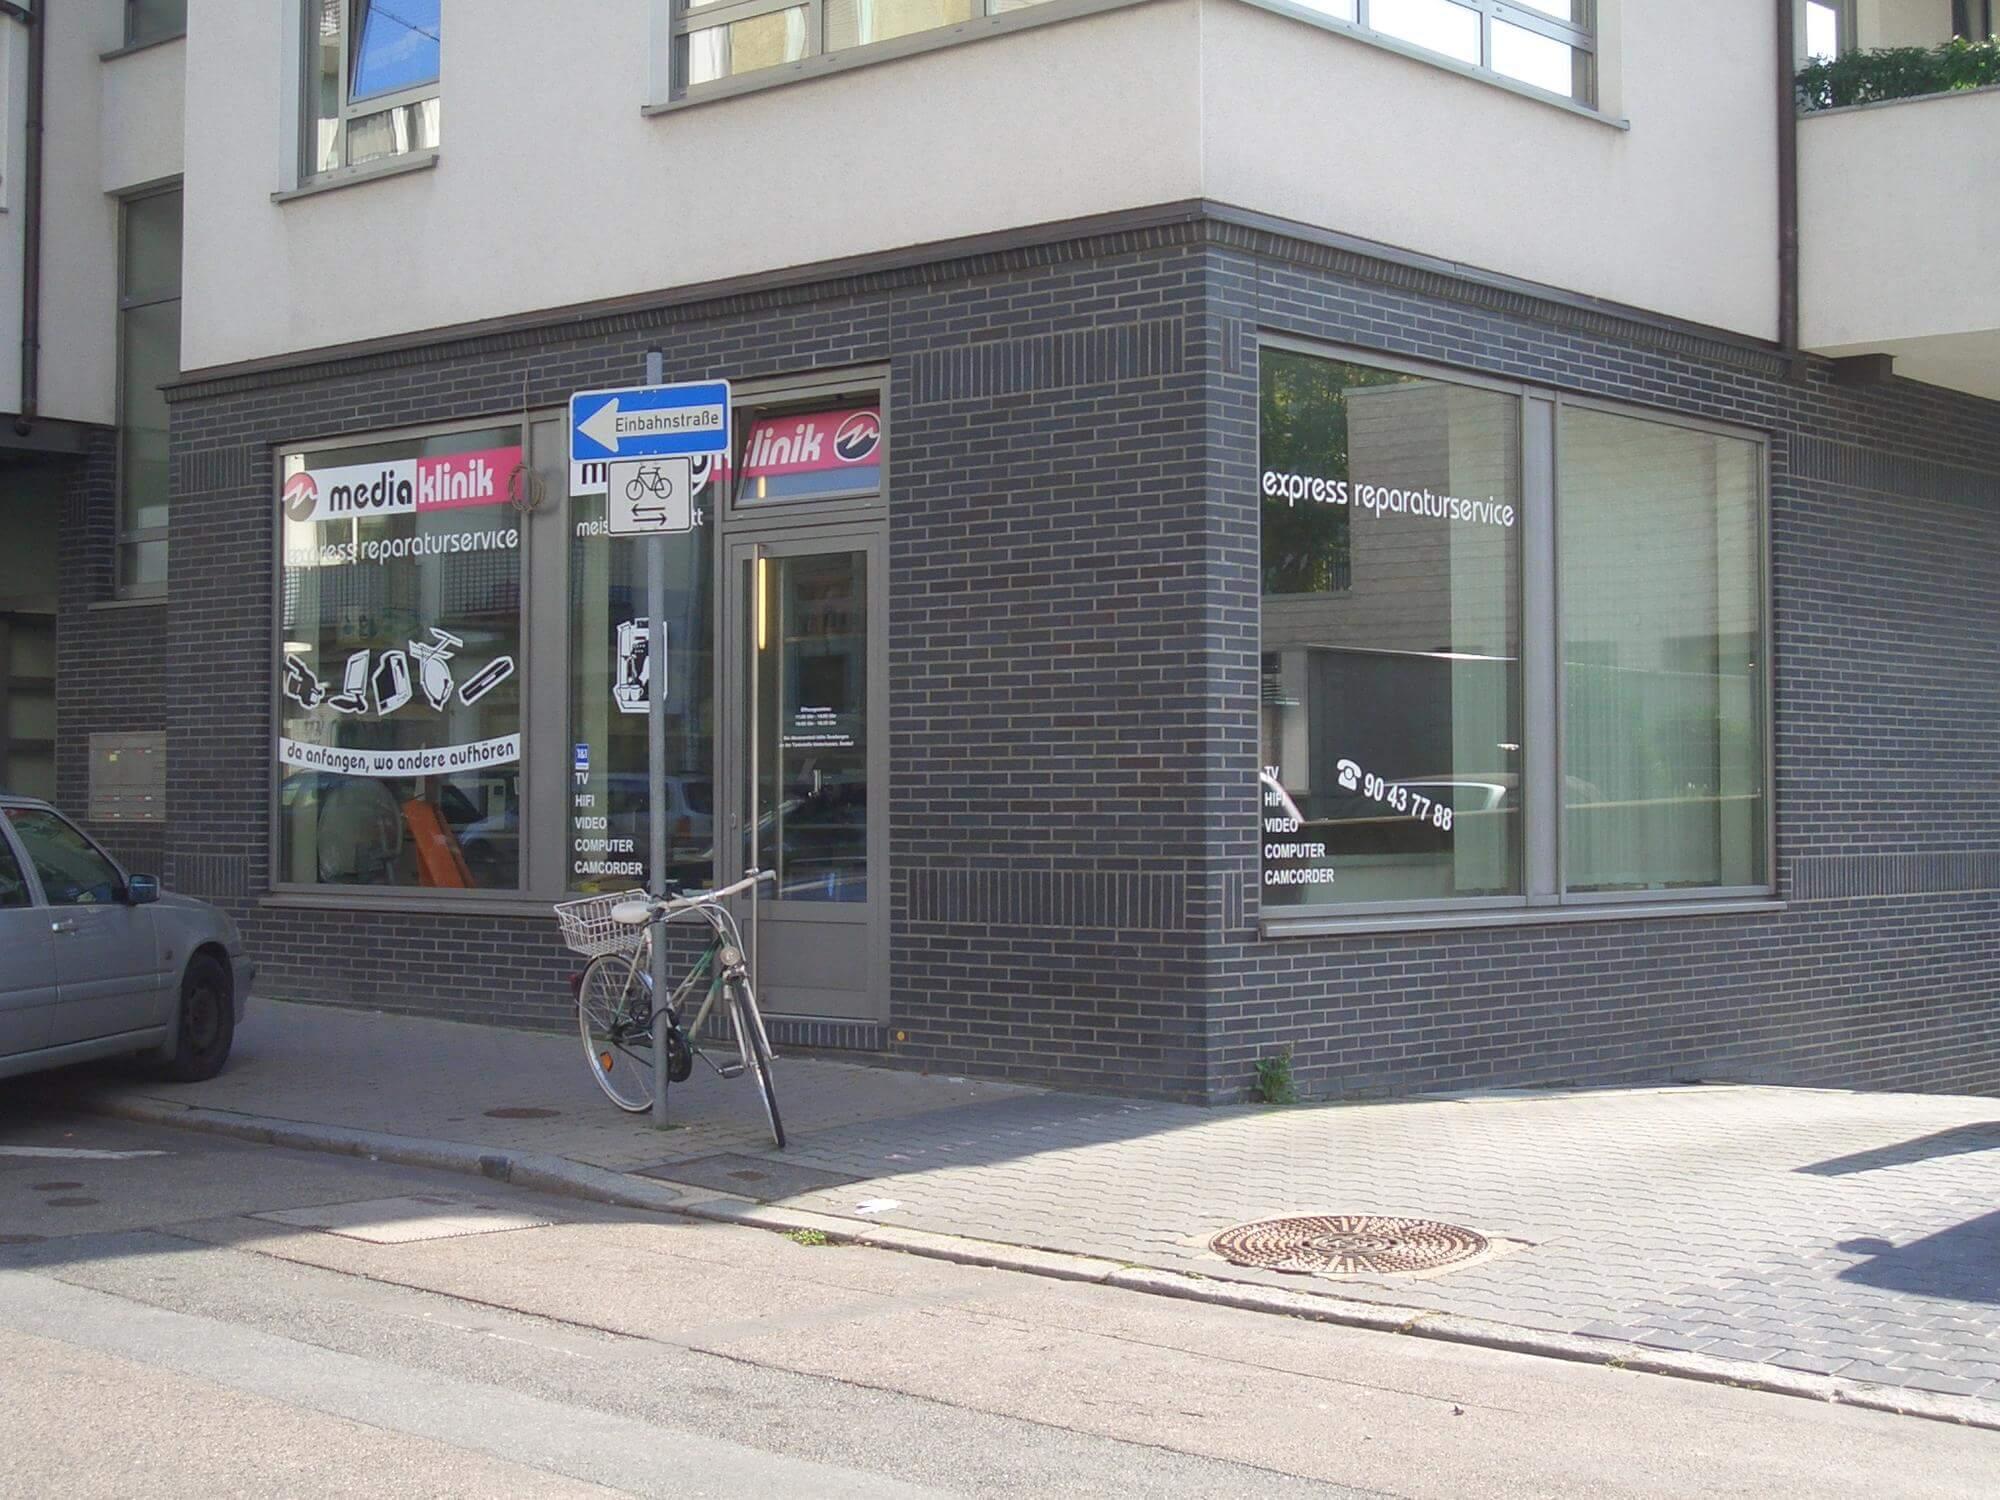 computer reparatur frankfurt am main mediaklinik sherman. Black Bedroom Furniture Sets. Home Design Ideas